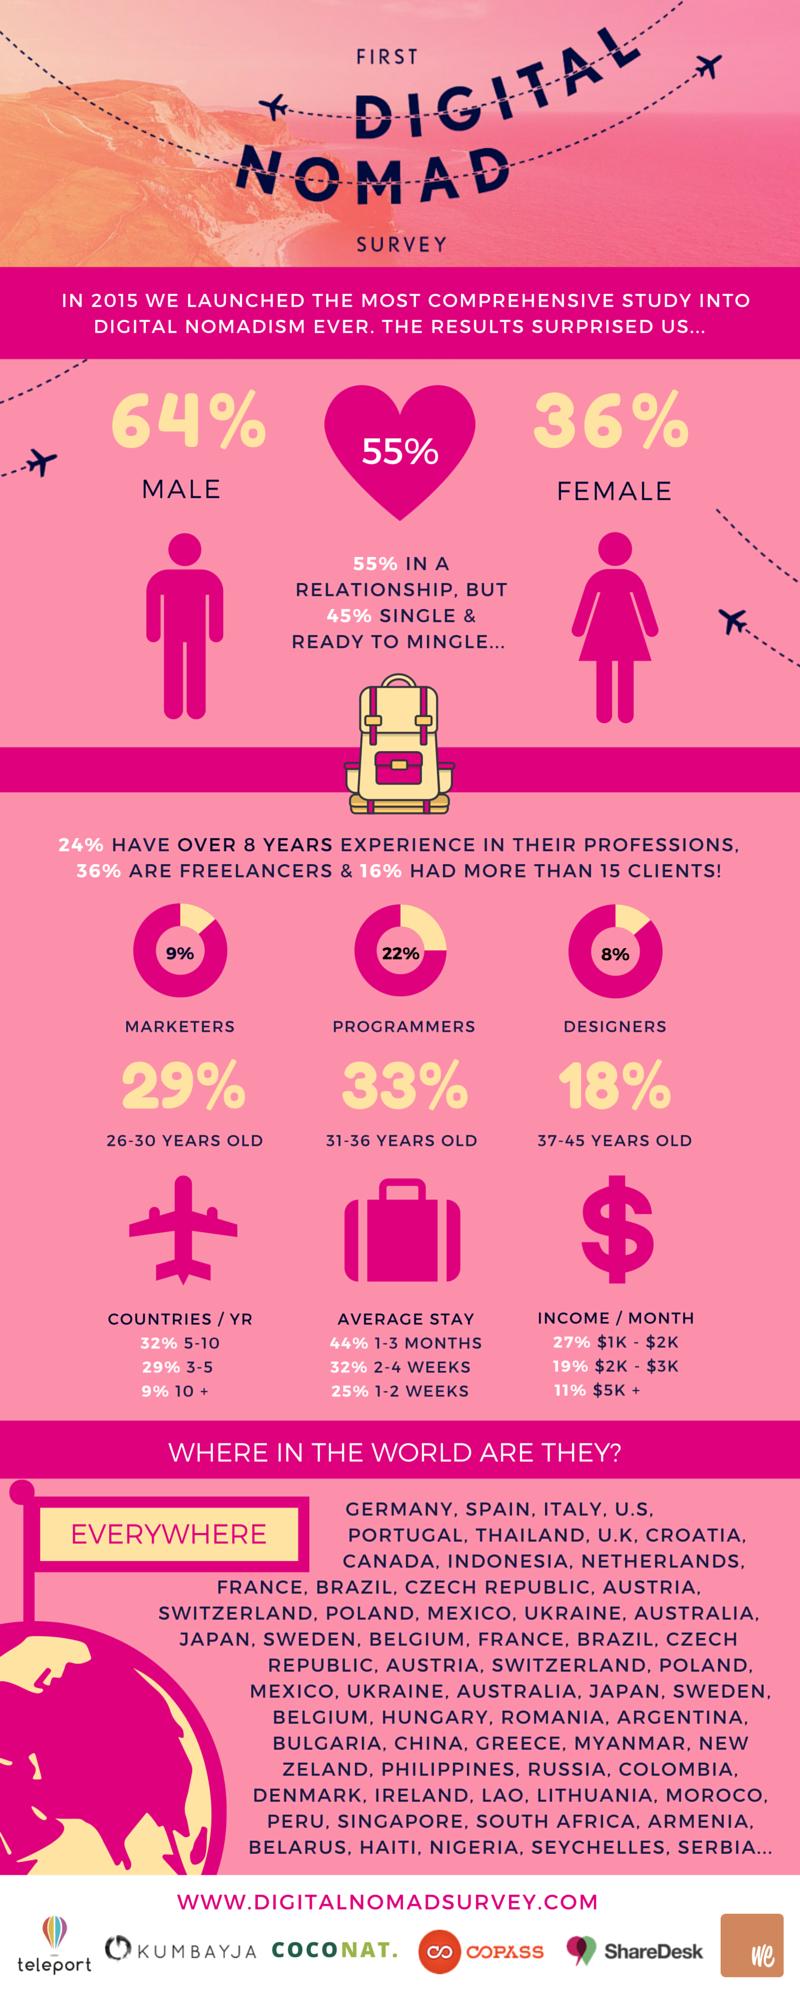 Digital Nomad Survey Infographic